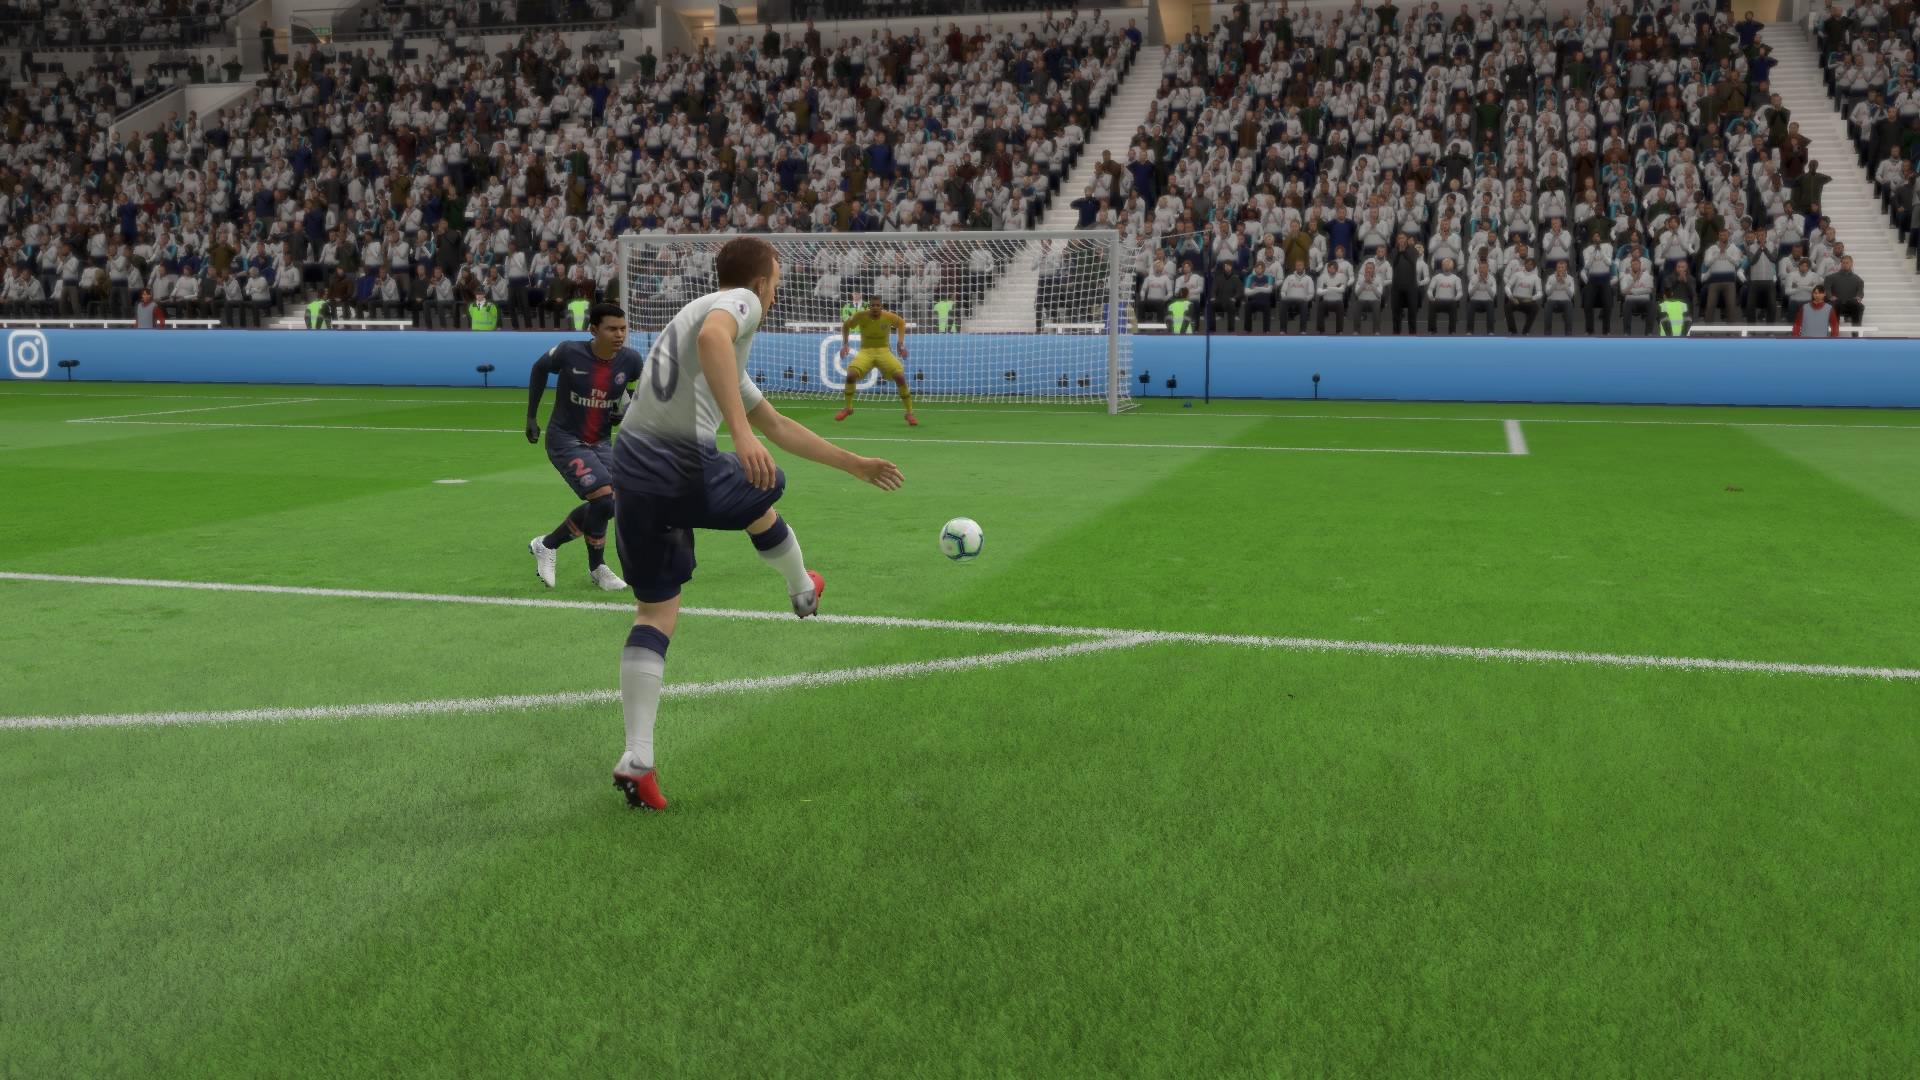 FIFA 20: release date, news, USRU4mLwUx6fx9Z6YPAQ